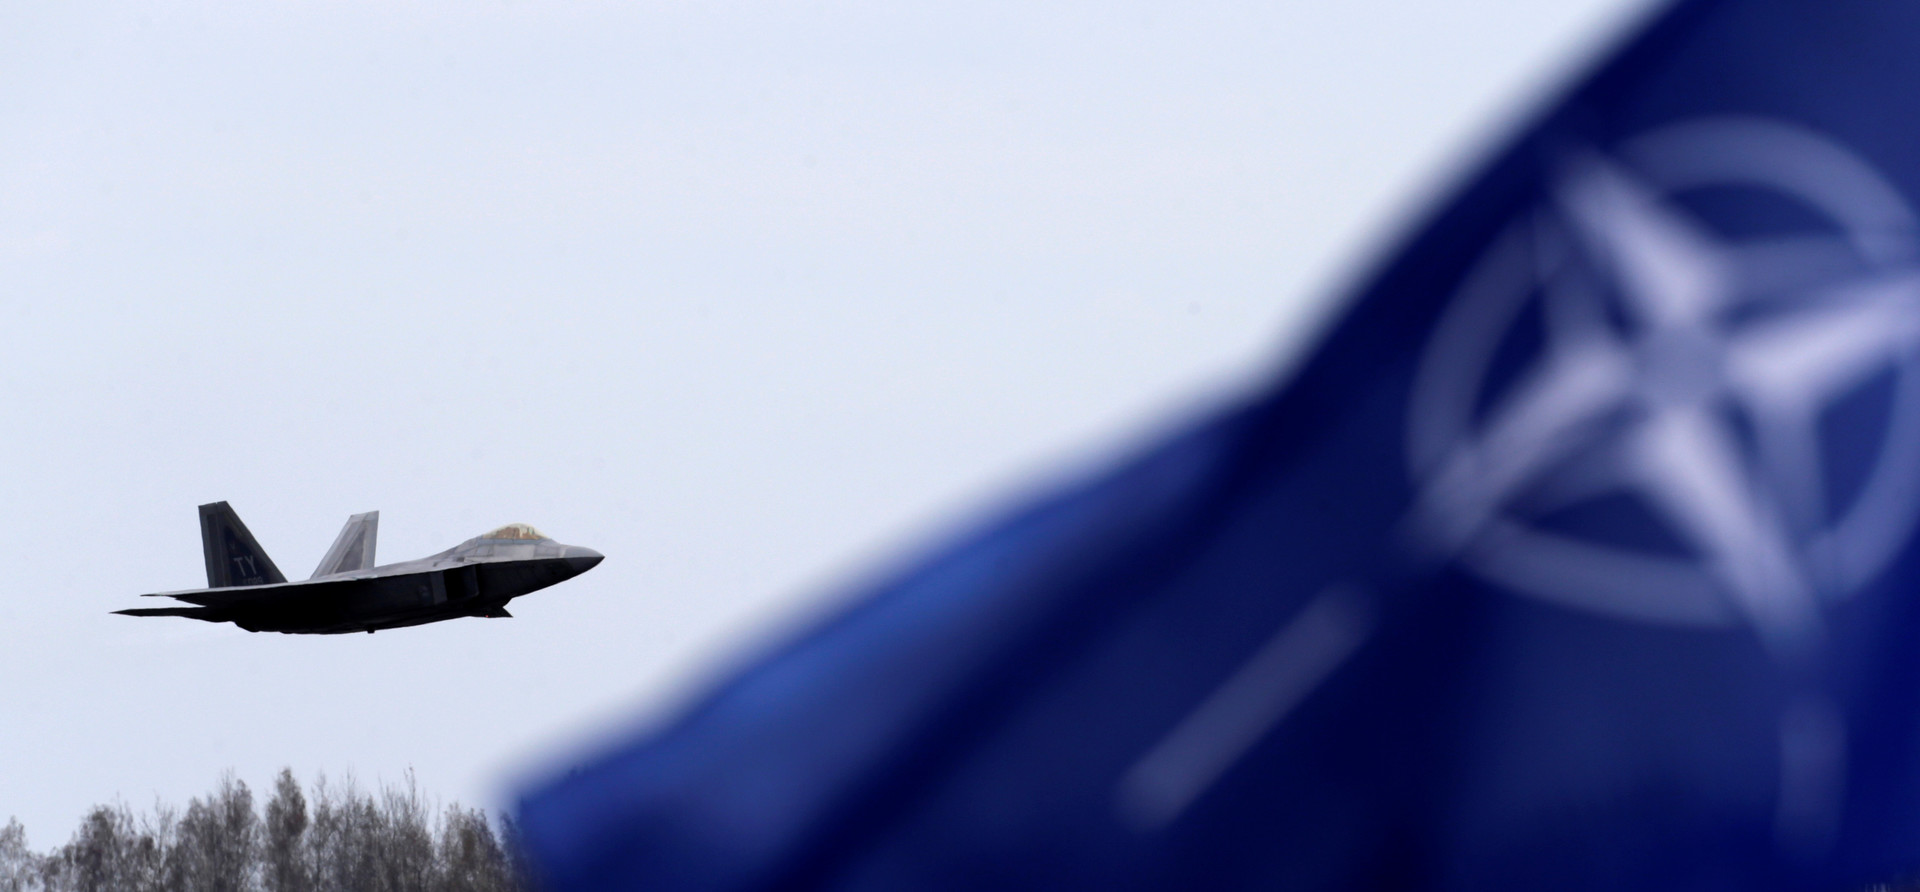 Экс-глава военного комитета НАТО: Россия нам не враг